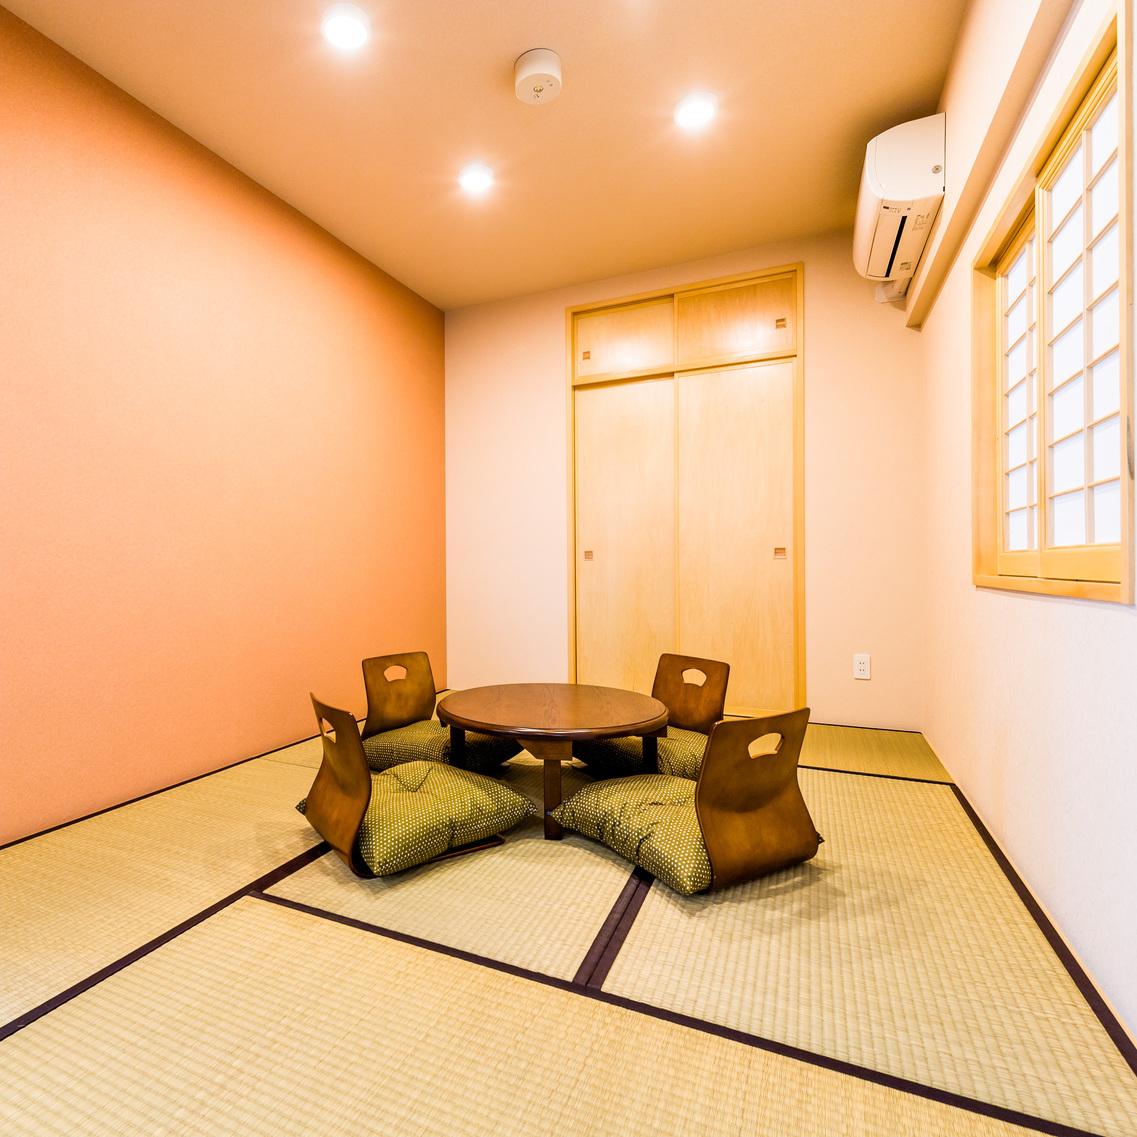 MINATO Chatan Seaside Condominium / 【Vacation Rental】バケーションレンタル≪素泊まり≫